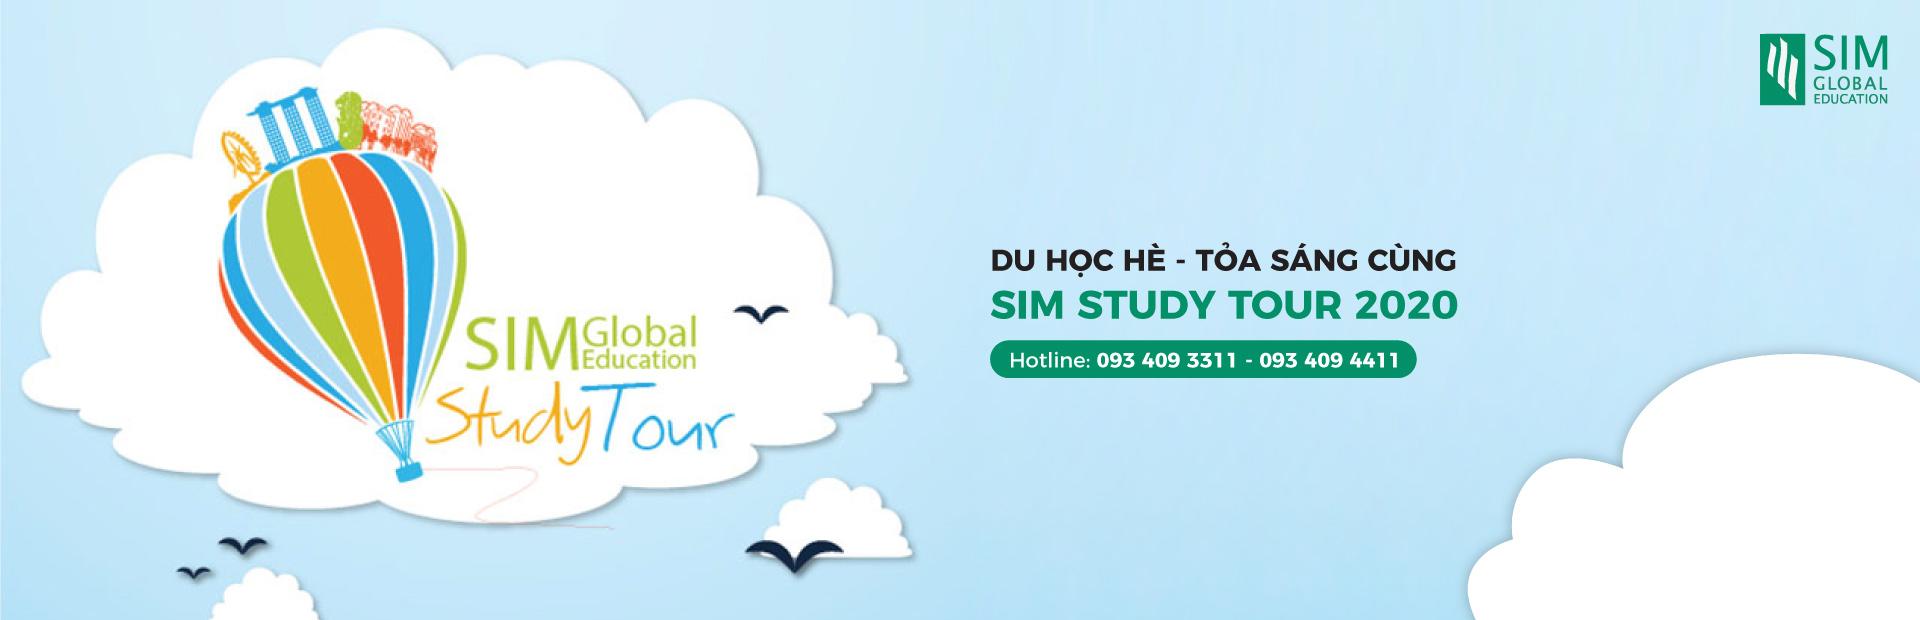 SIM Study tour 2020